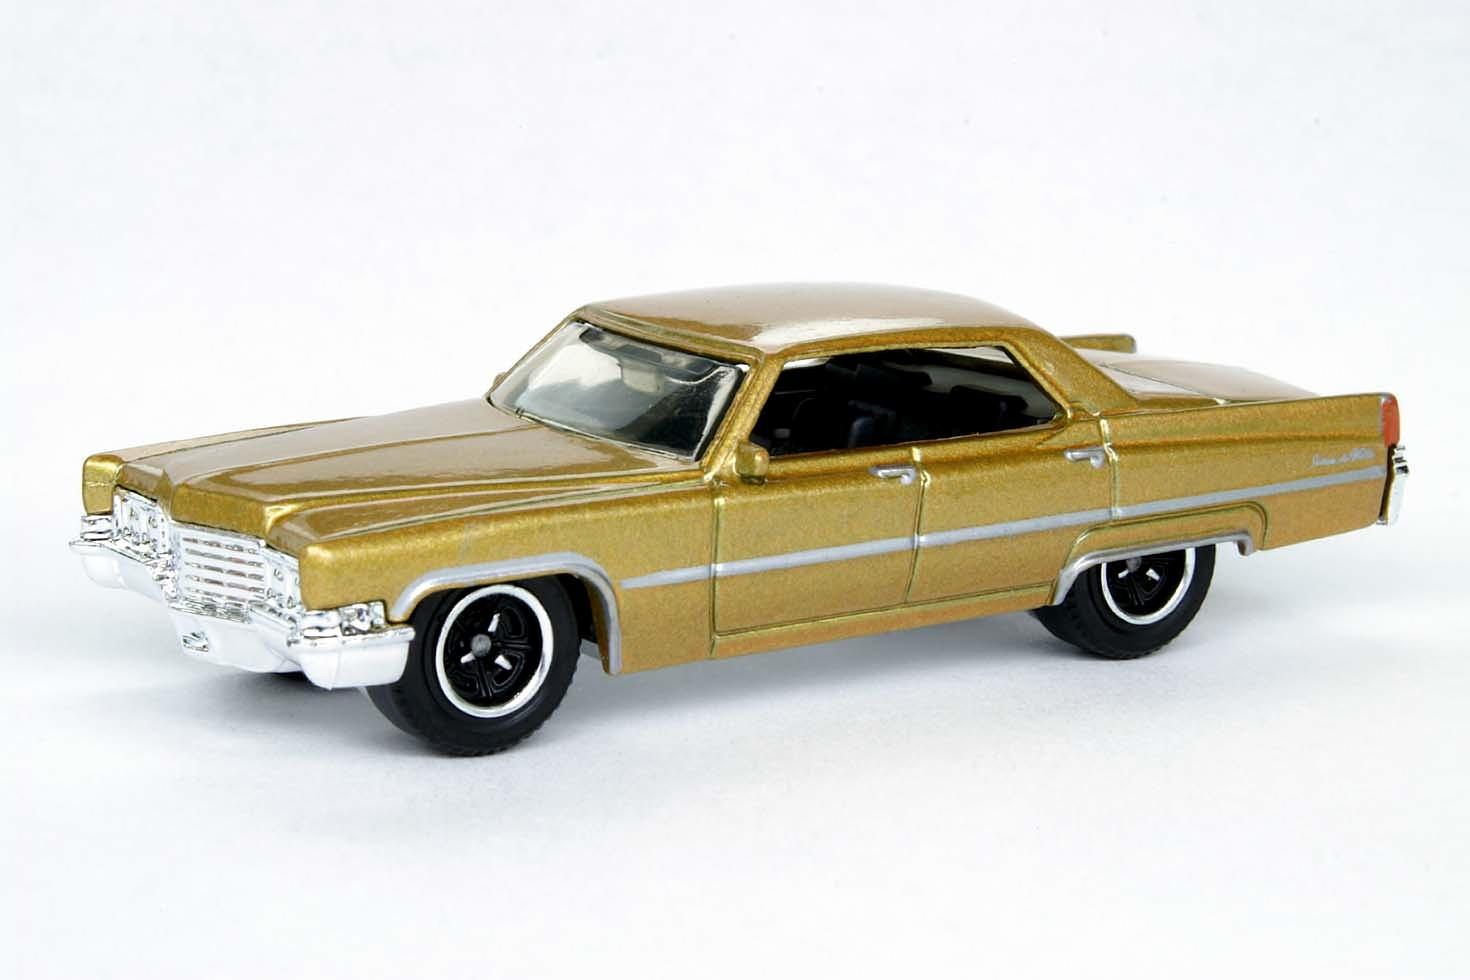 69 Cadillac Sedan Deville Matchbox Cars Wiki Fandom Powered By Wikia